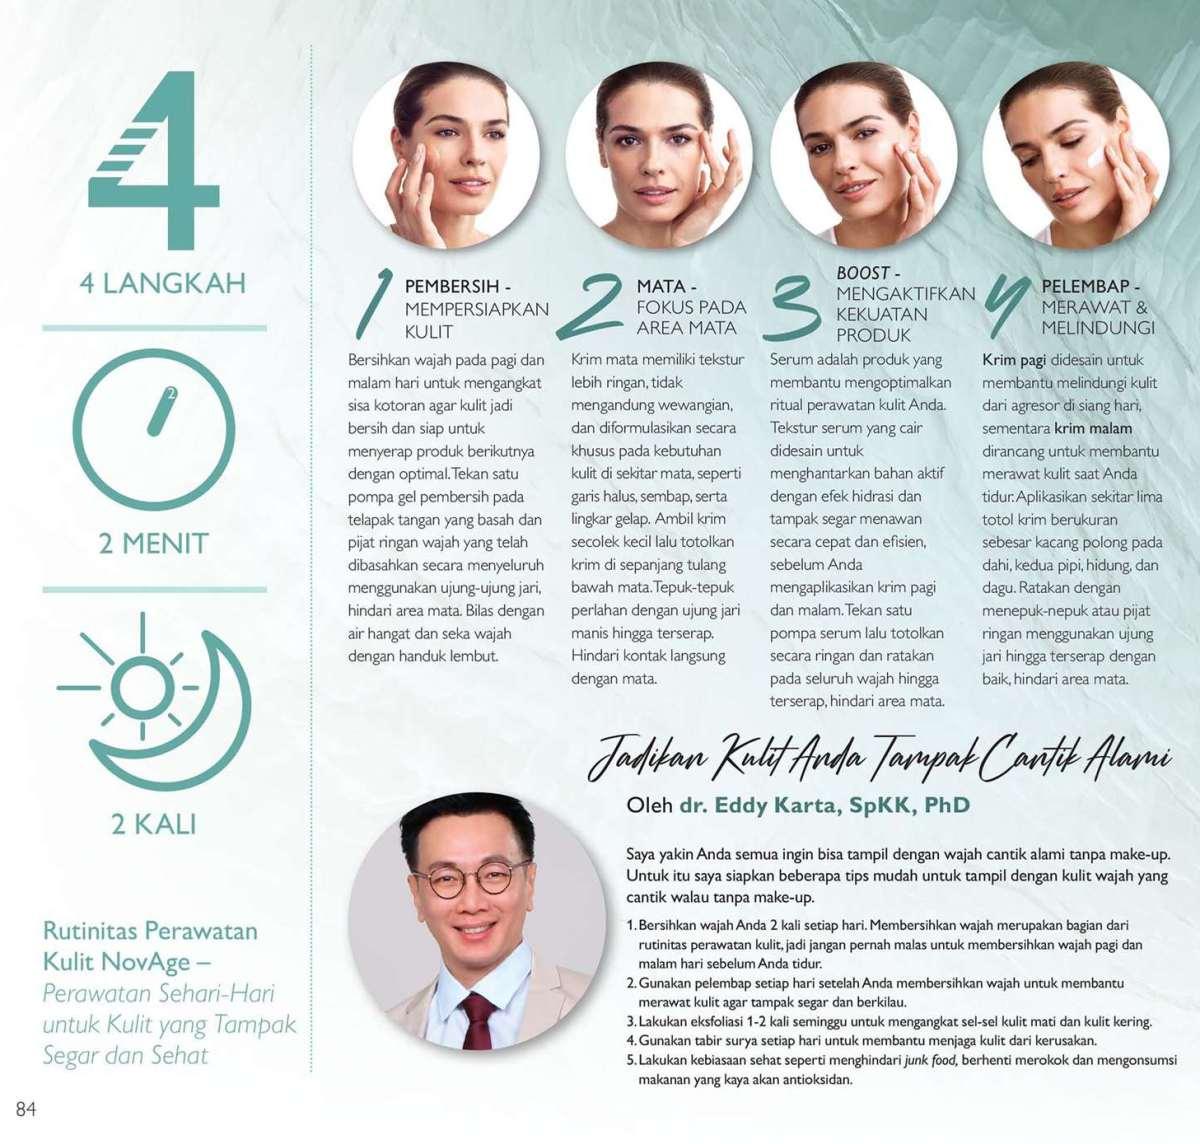 Katalog Oriflame November 2019 Hal 084